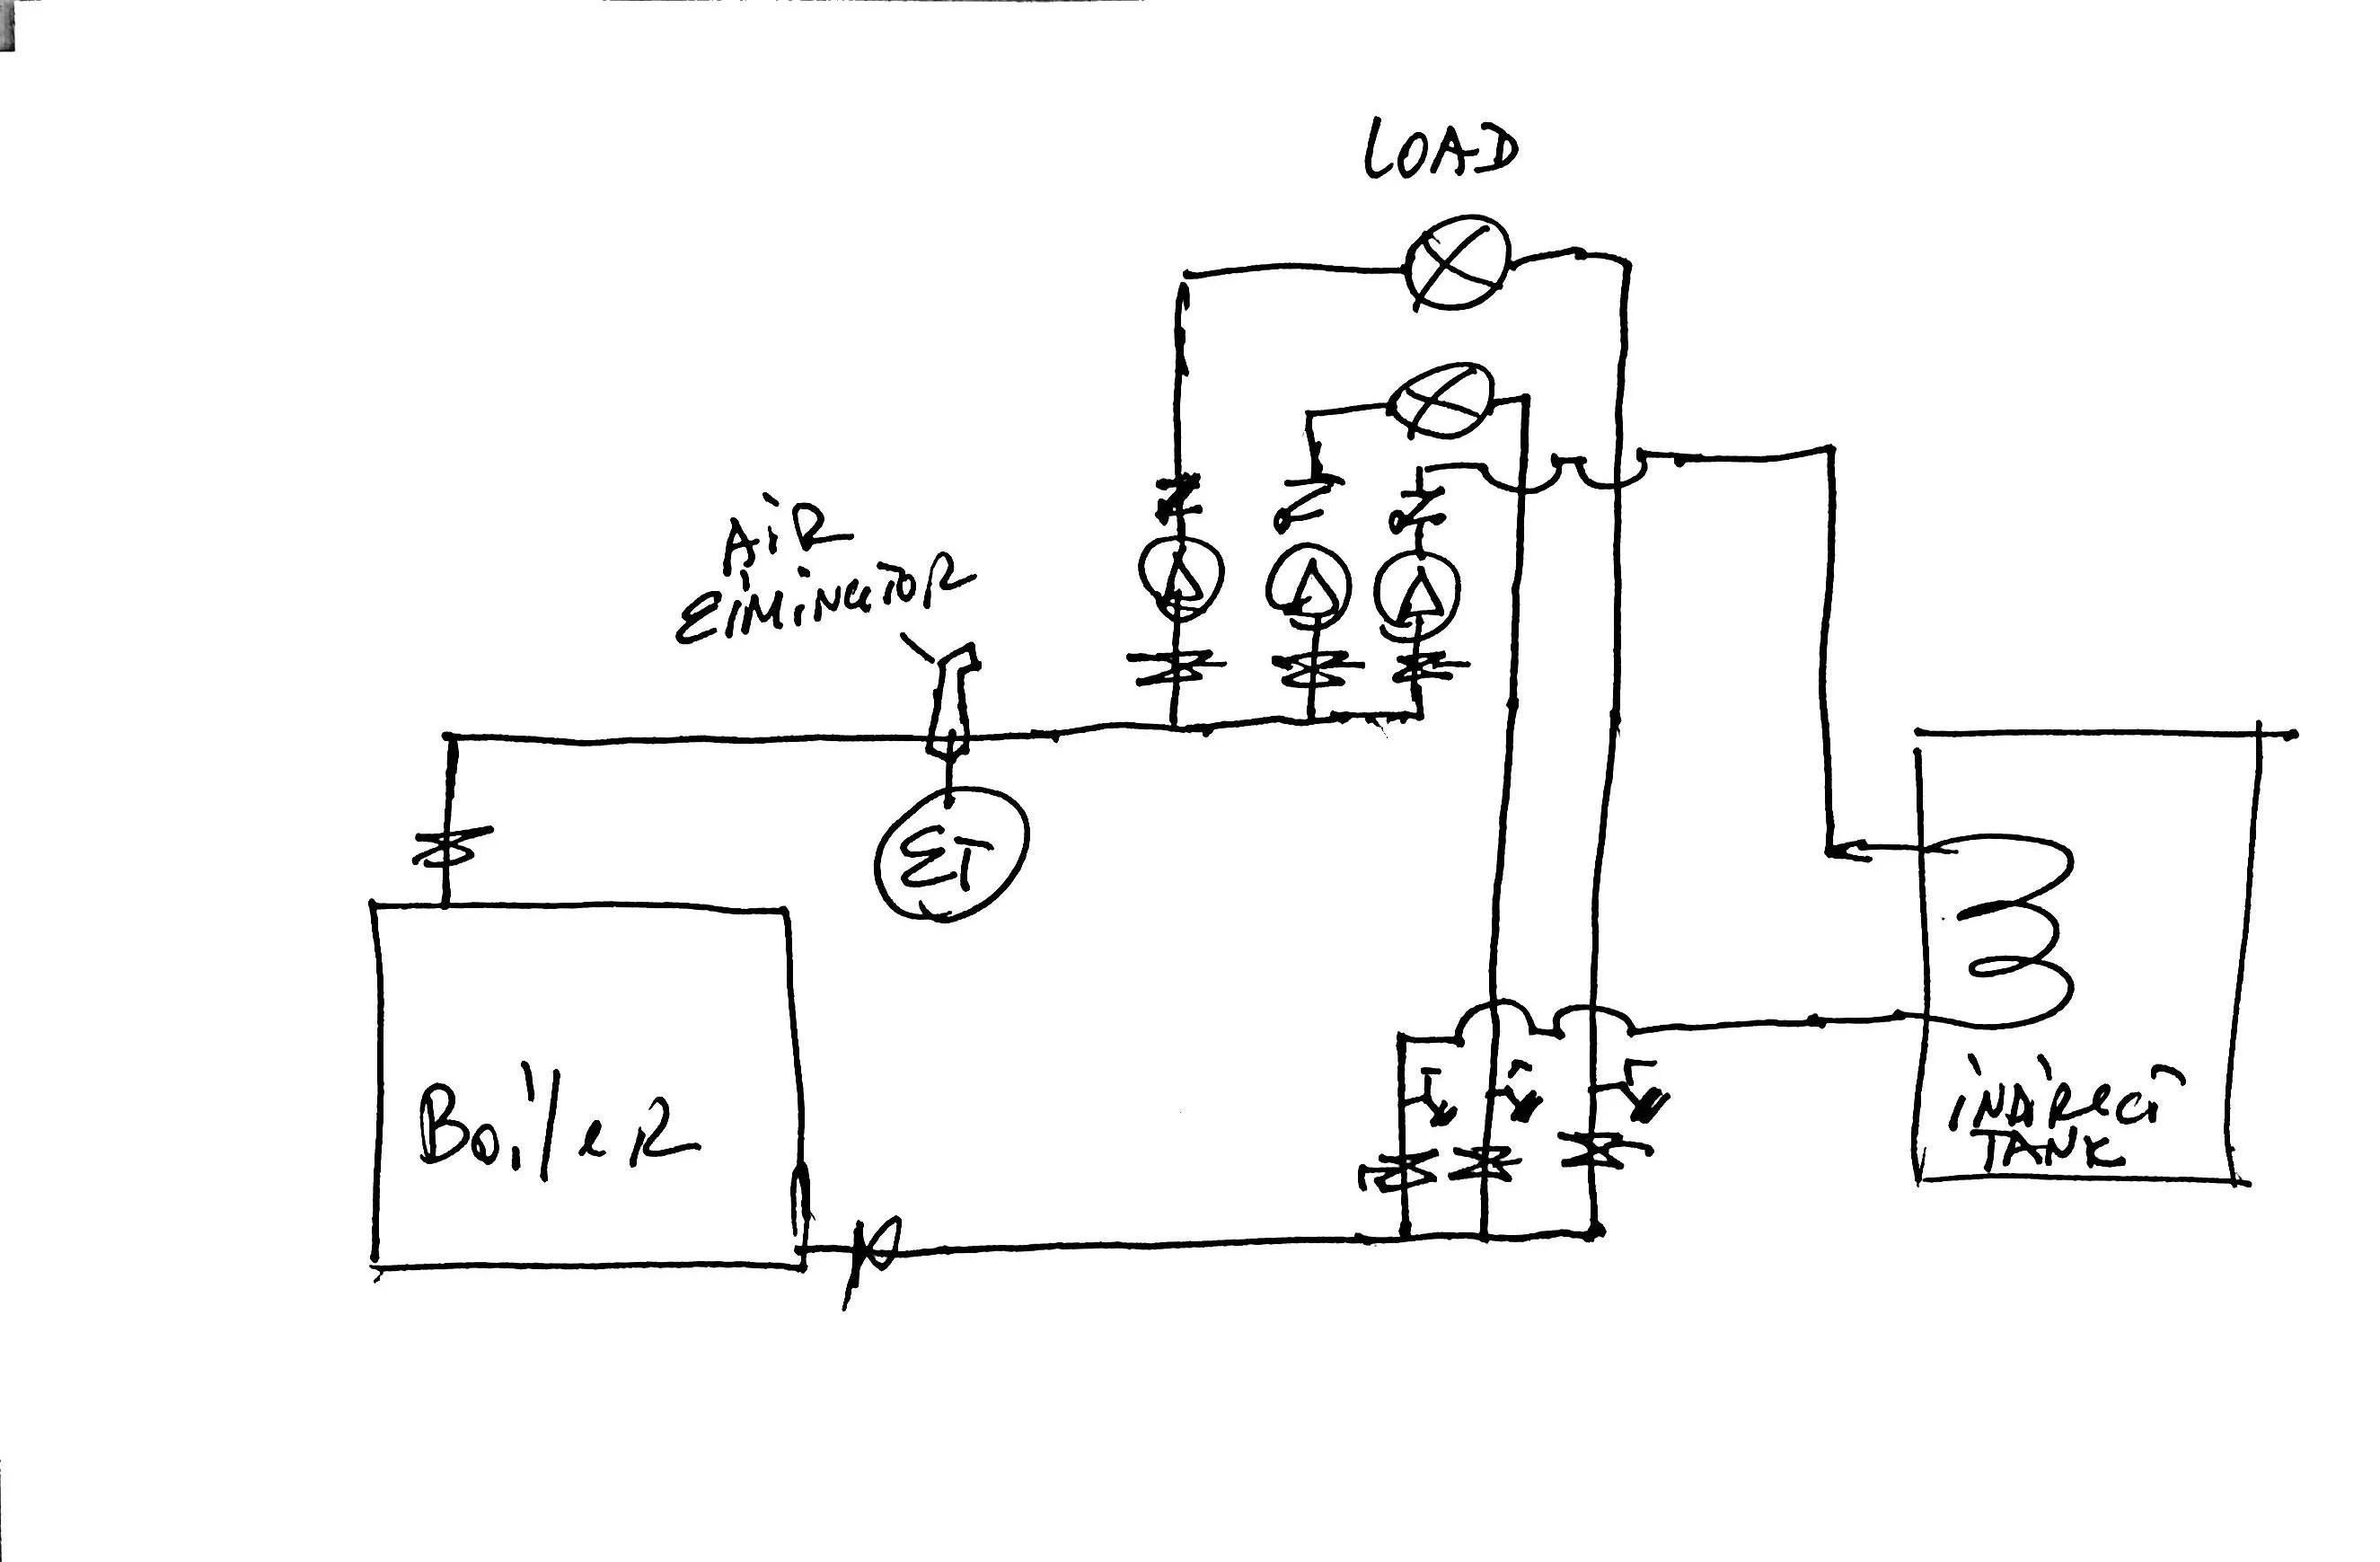 Yamaha Rhino 660 4x4 Wiring Diagram